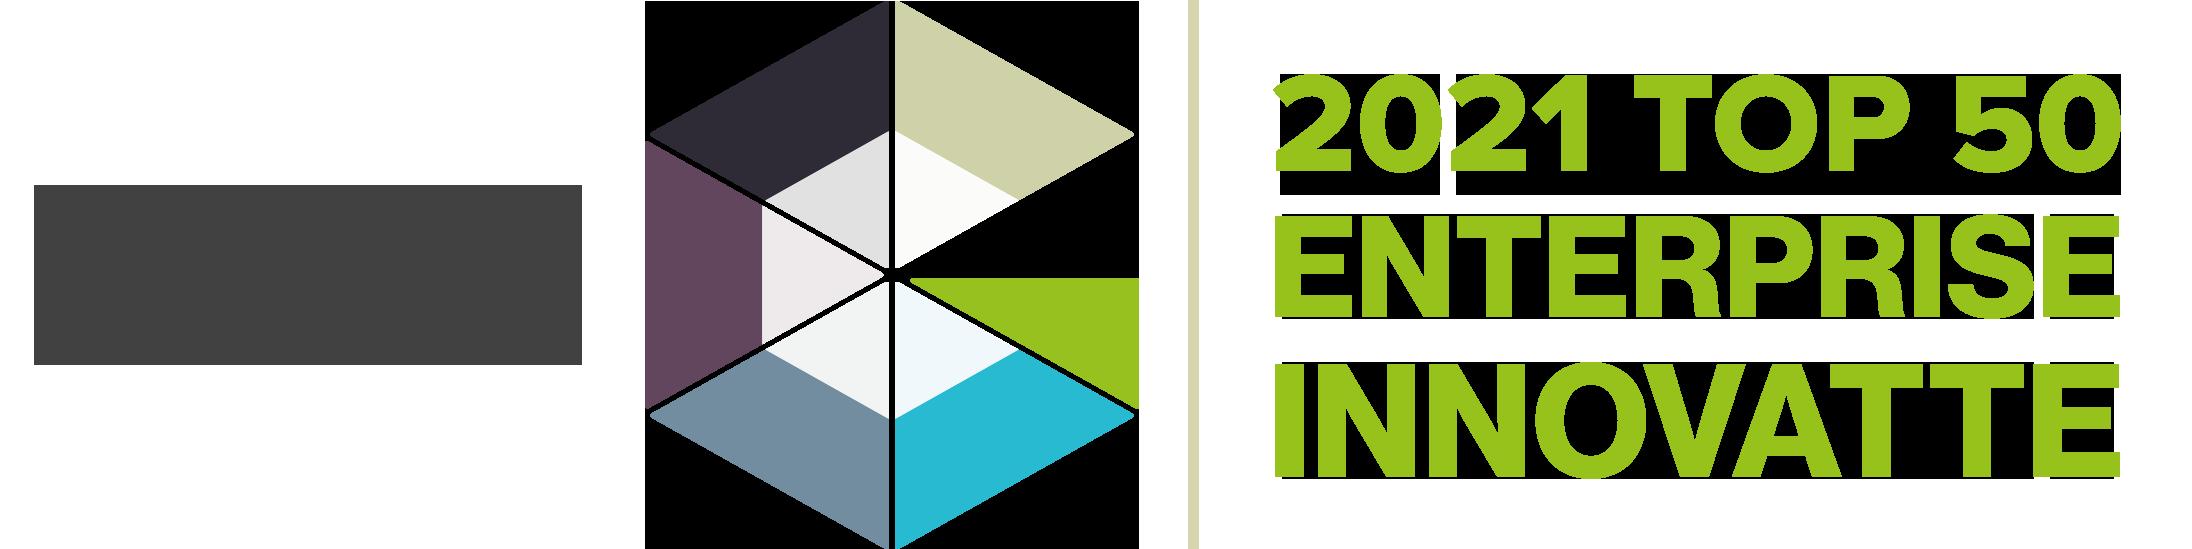 Top 50 Enterprise Innovante - 2021 GRIT